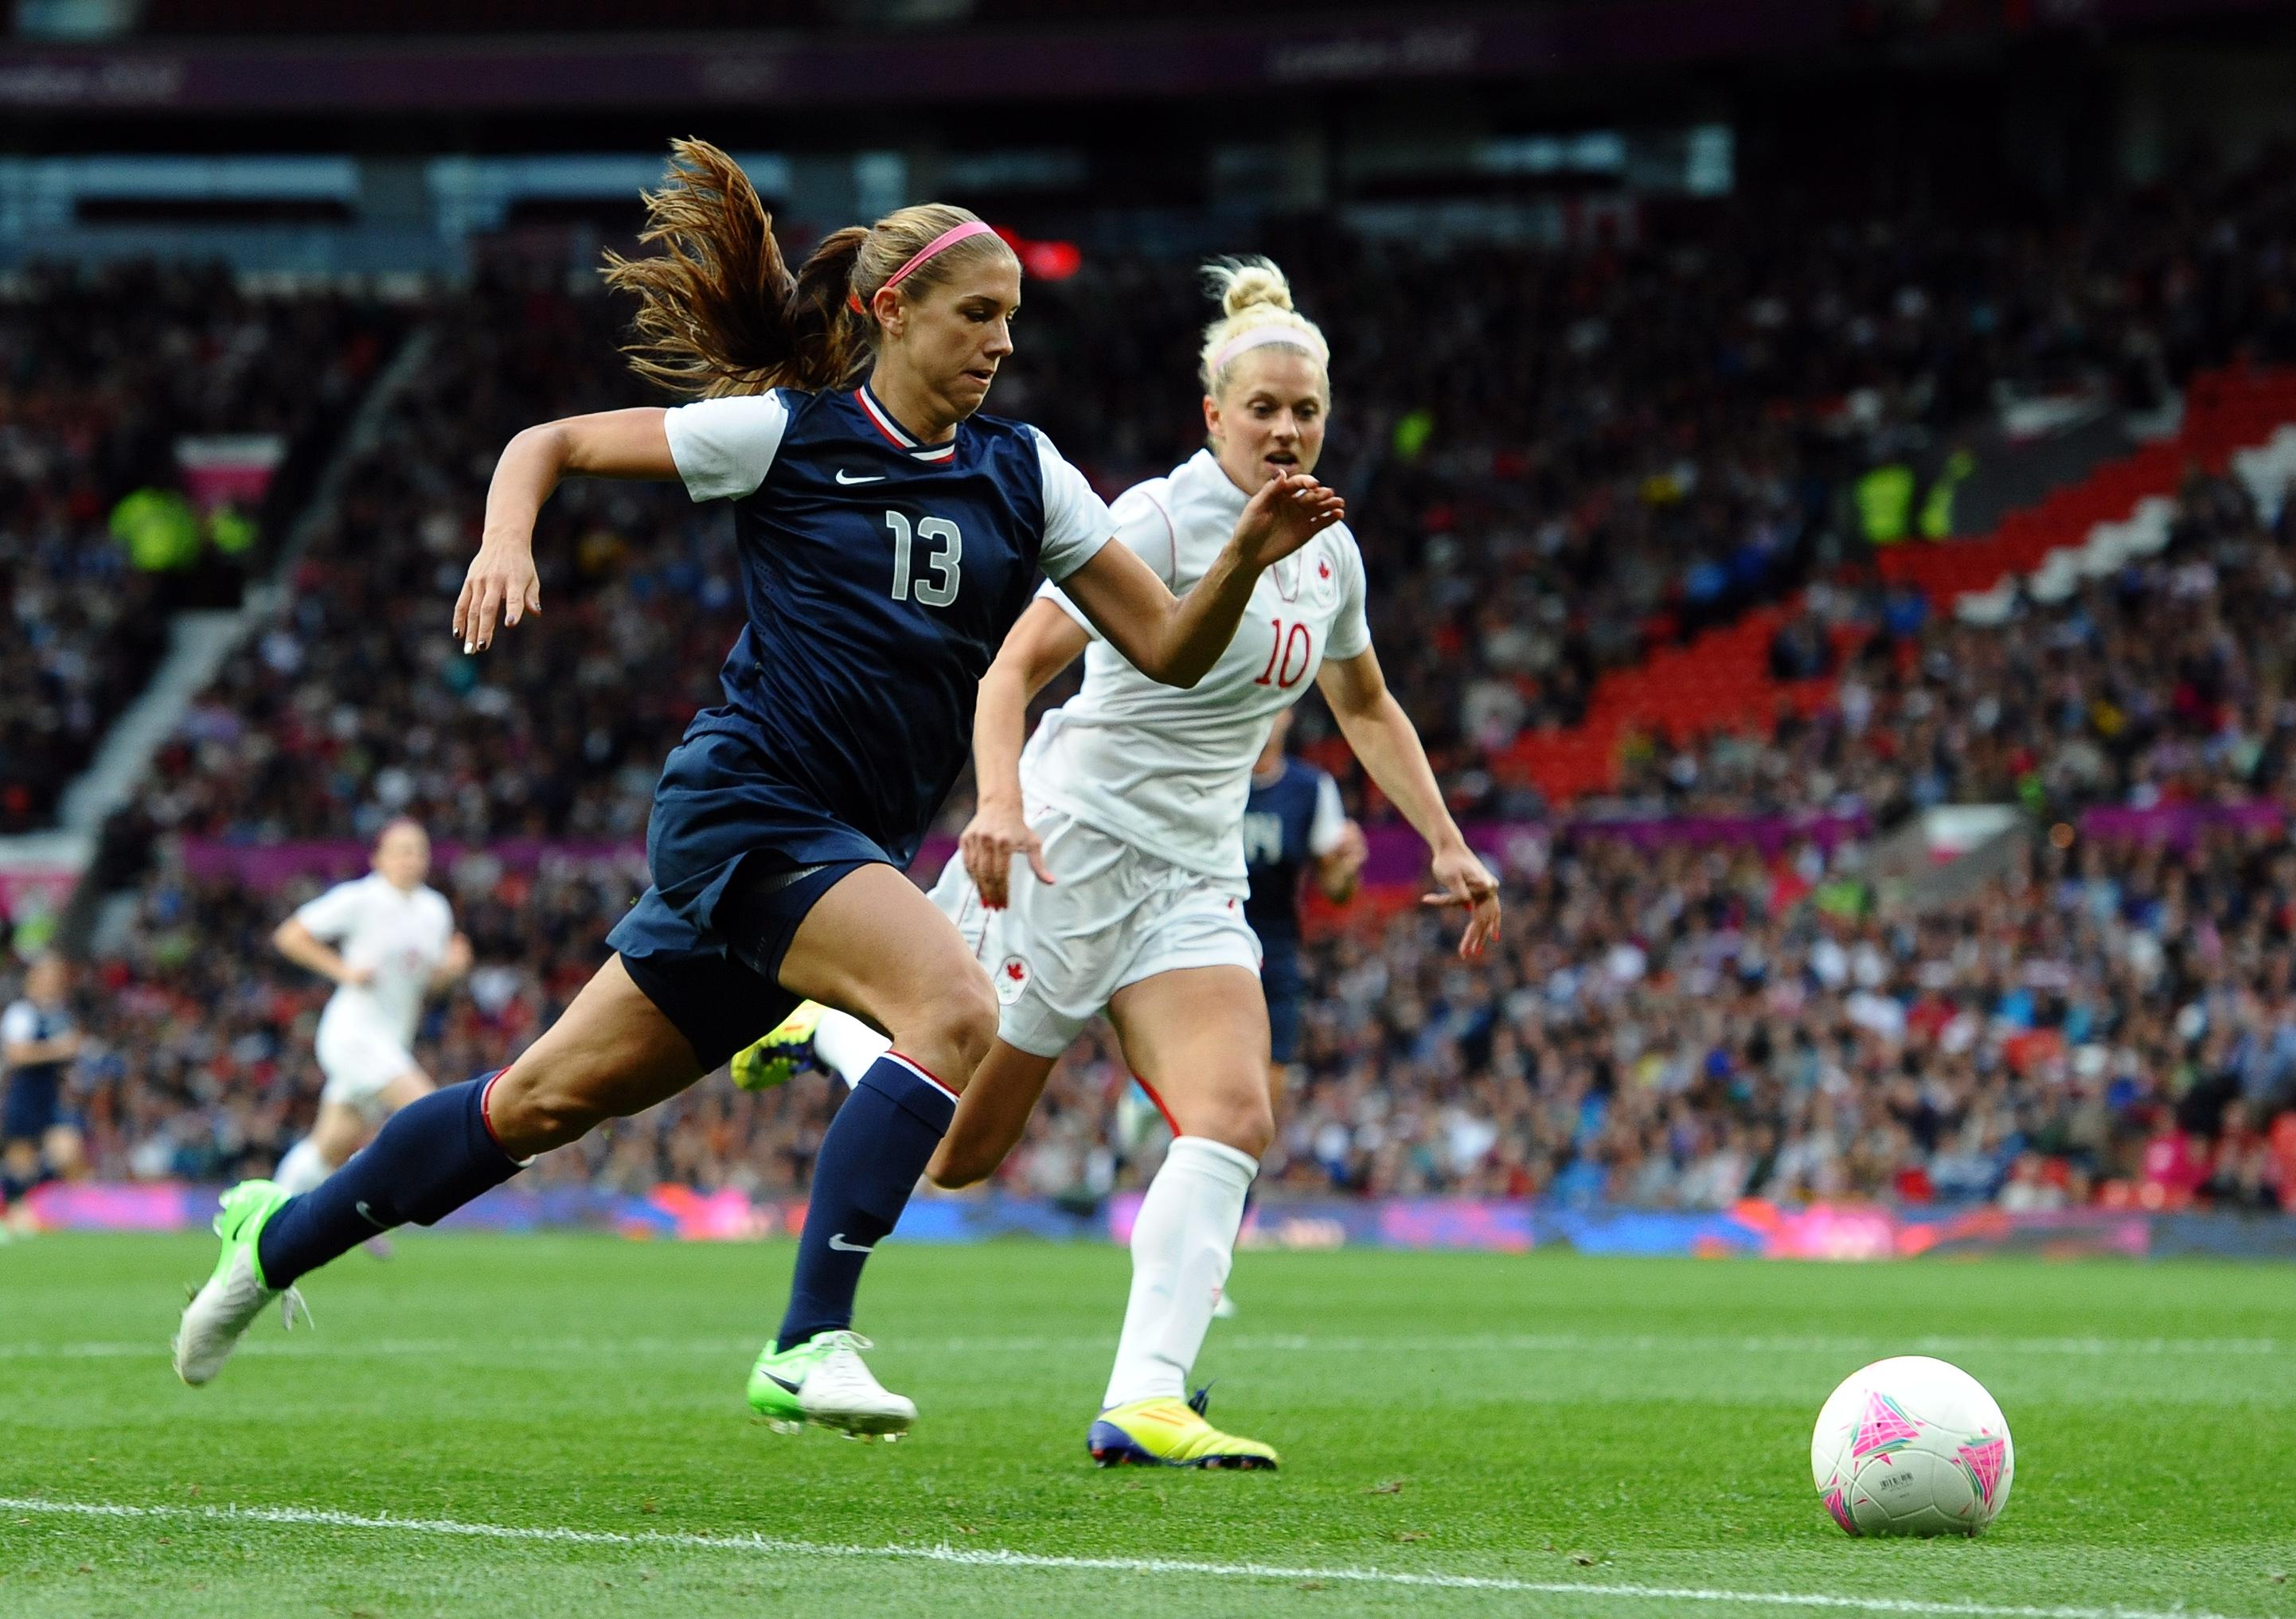 Usa Soccer Wallpapers: USA Women's Soccer Wallpapers